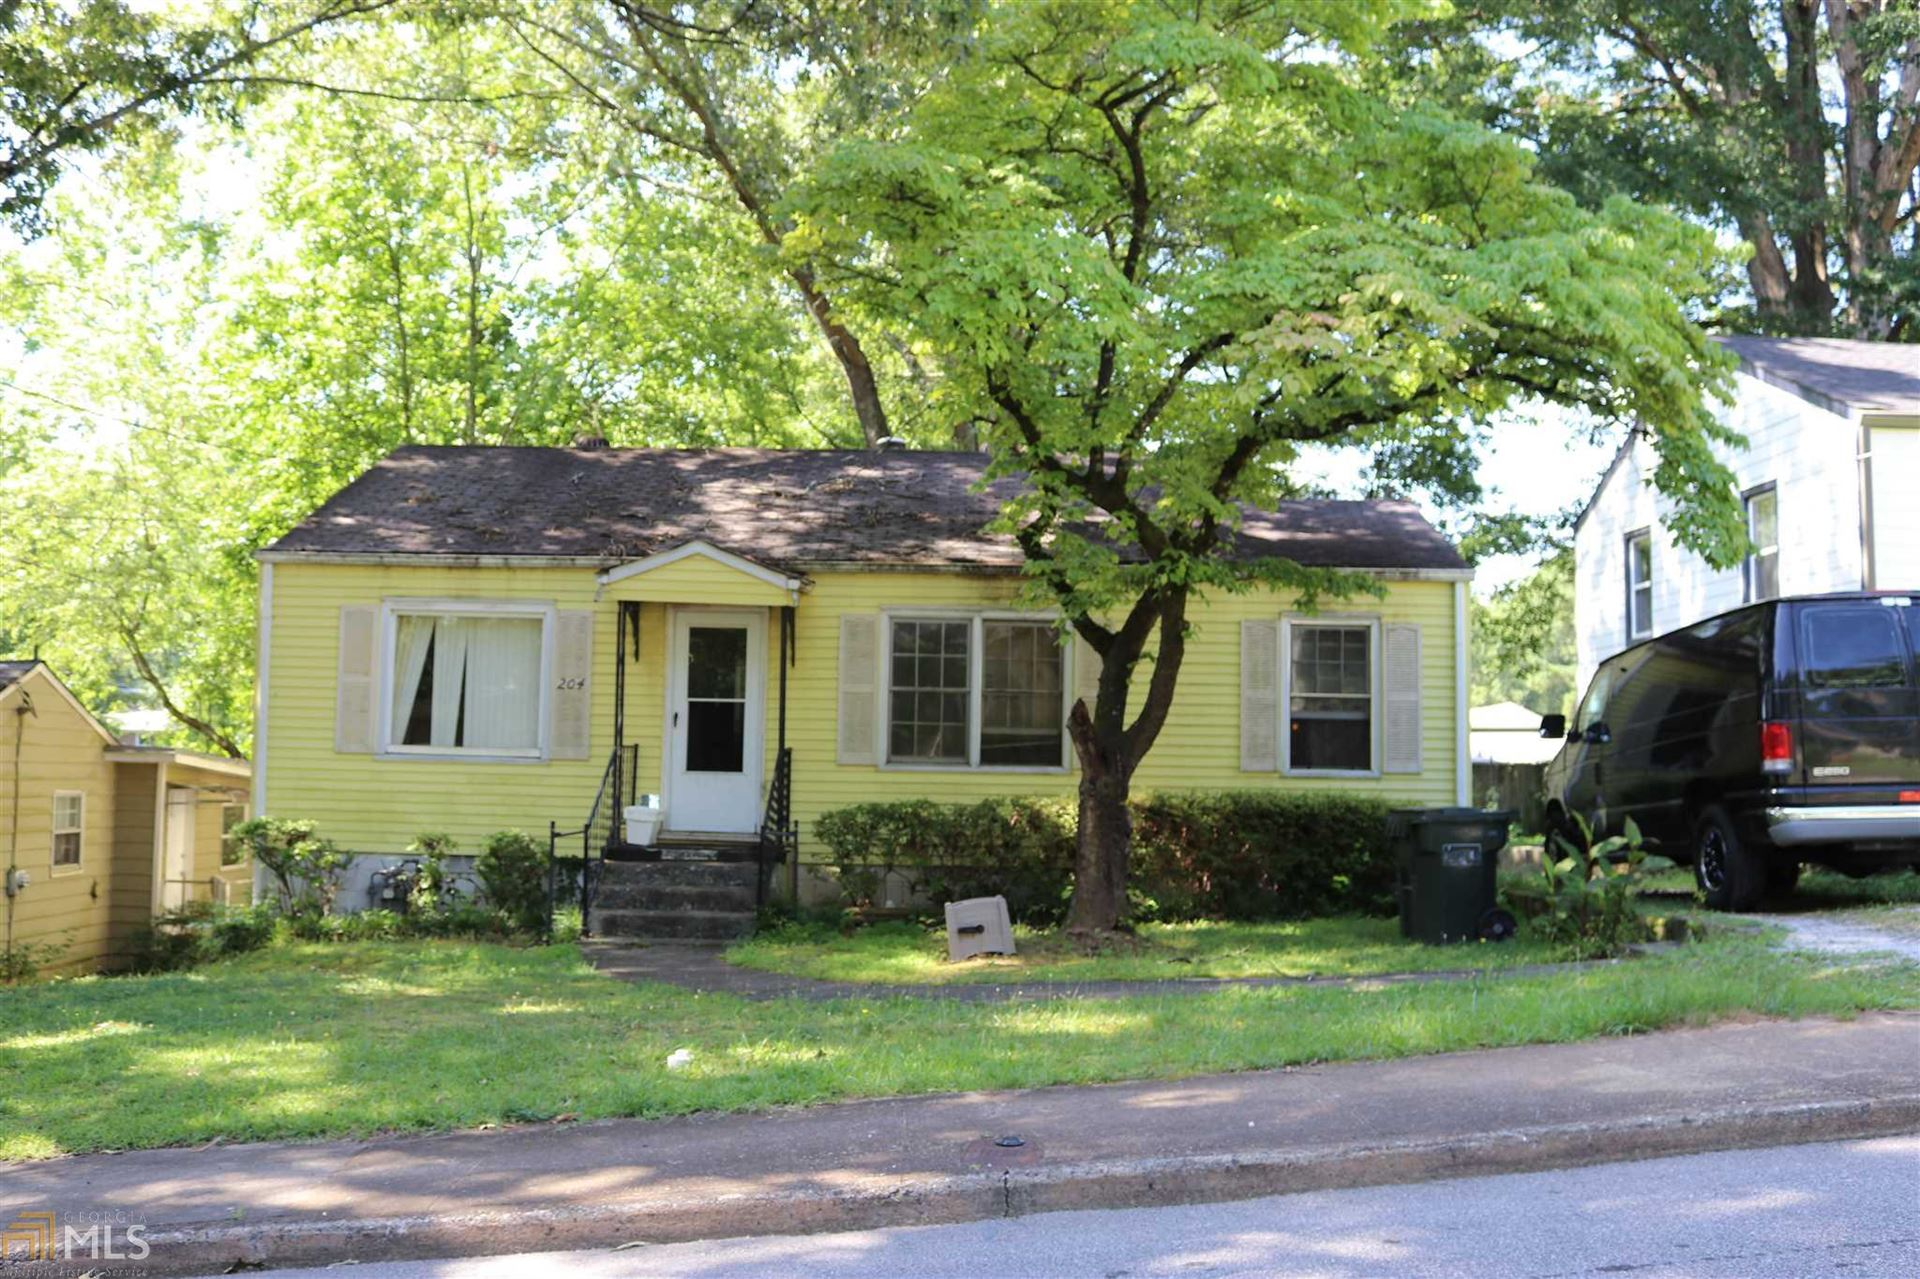 204 Birch St, Hapeville, GA 30354 - MLS#: 8820477